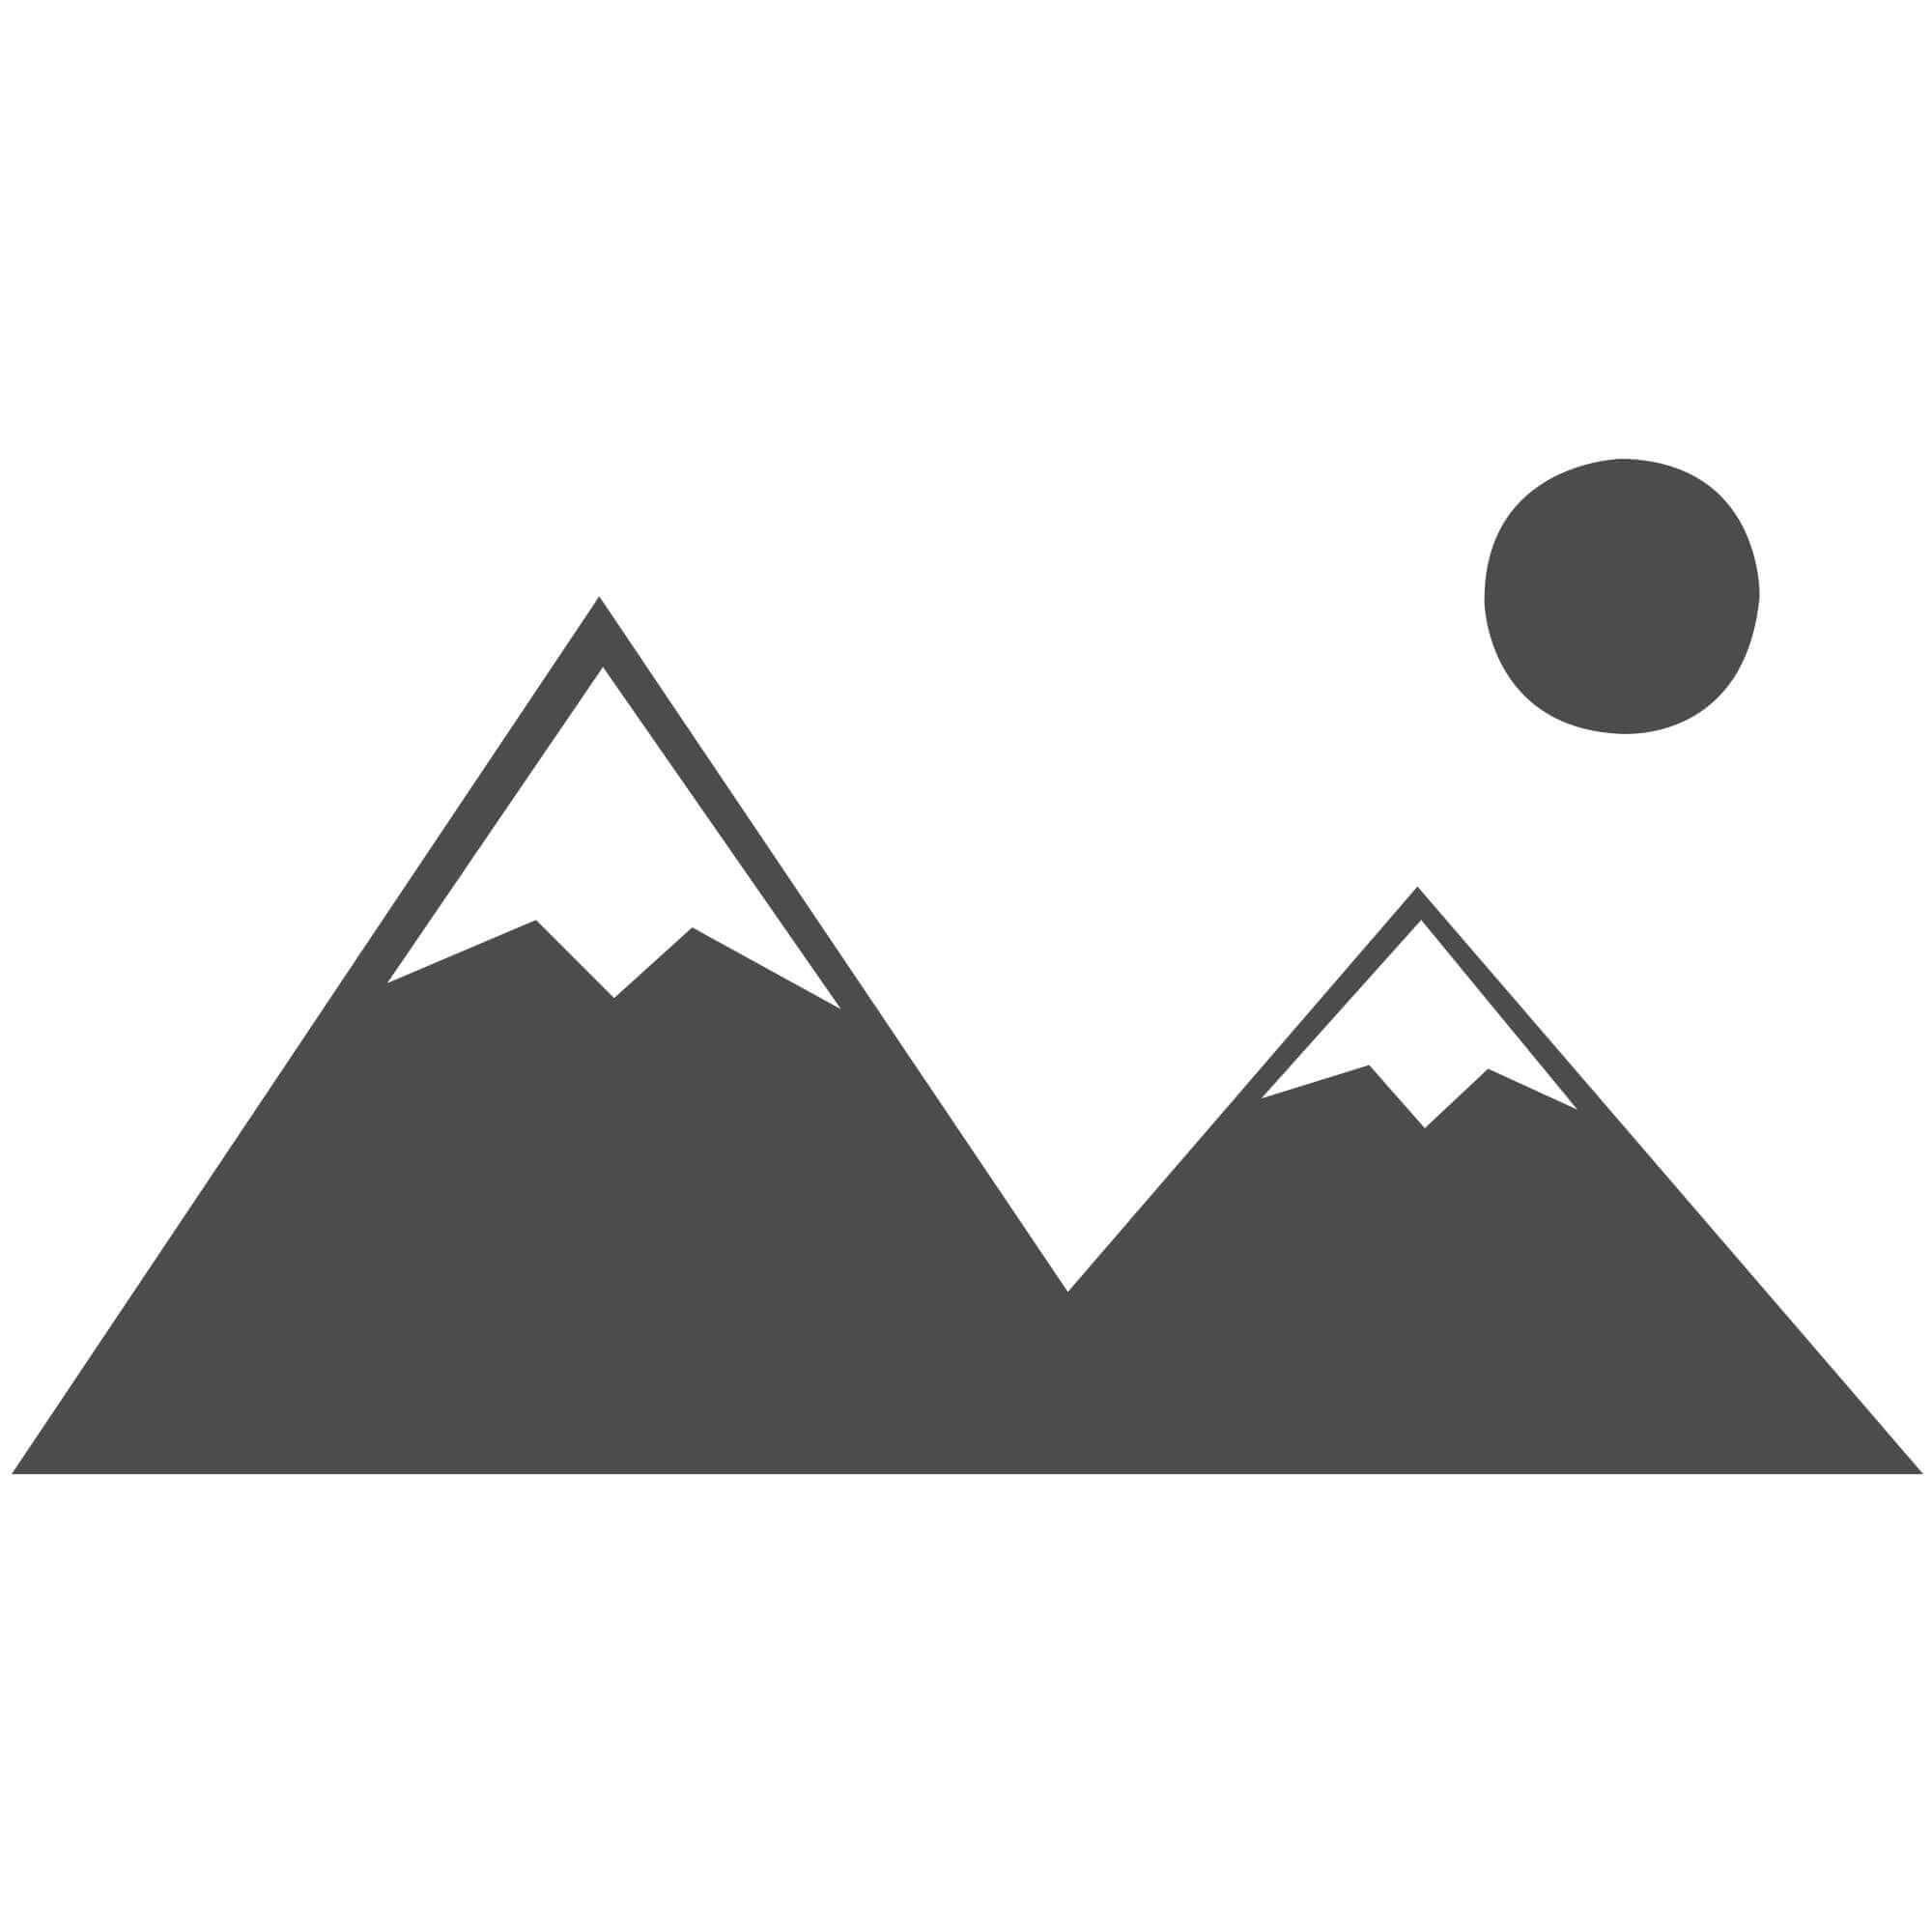 "Serenity Super-Soft Shaggy - Silver - Size 120 x 170 cm (4' x 5'7"")"